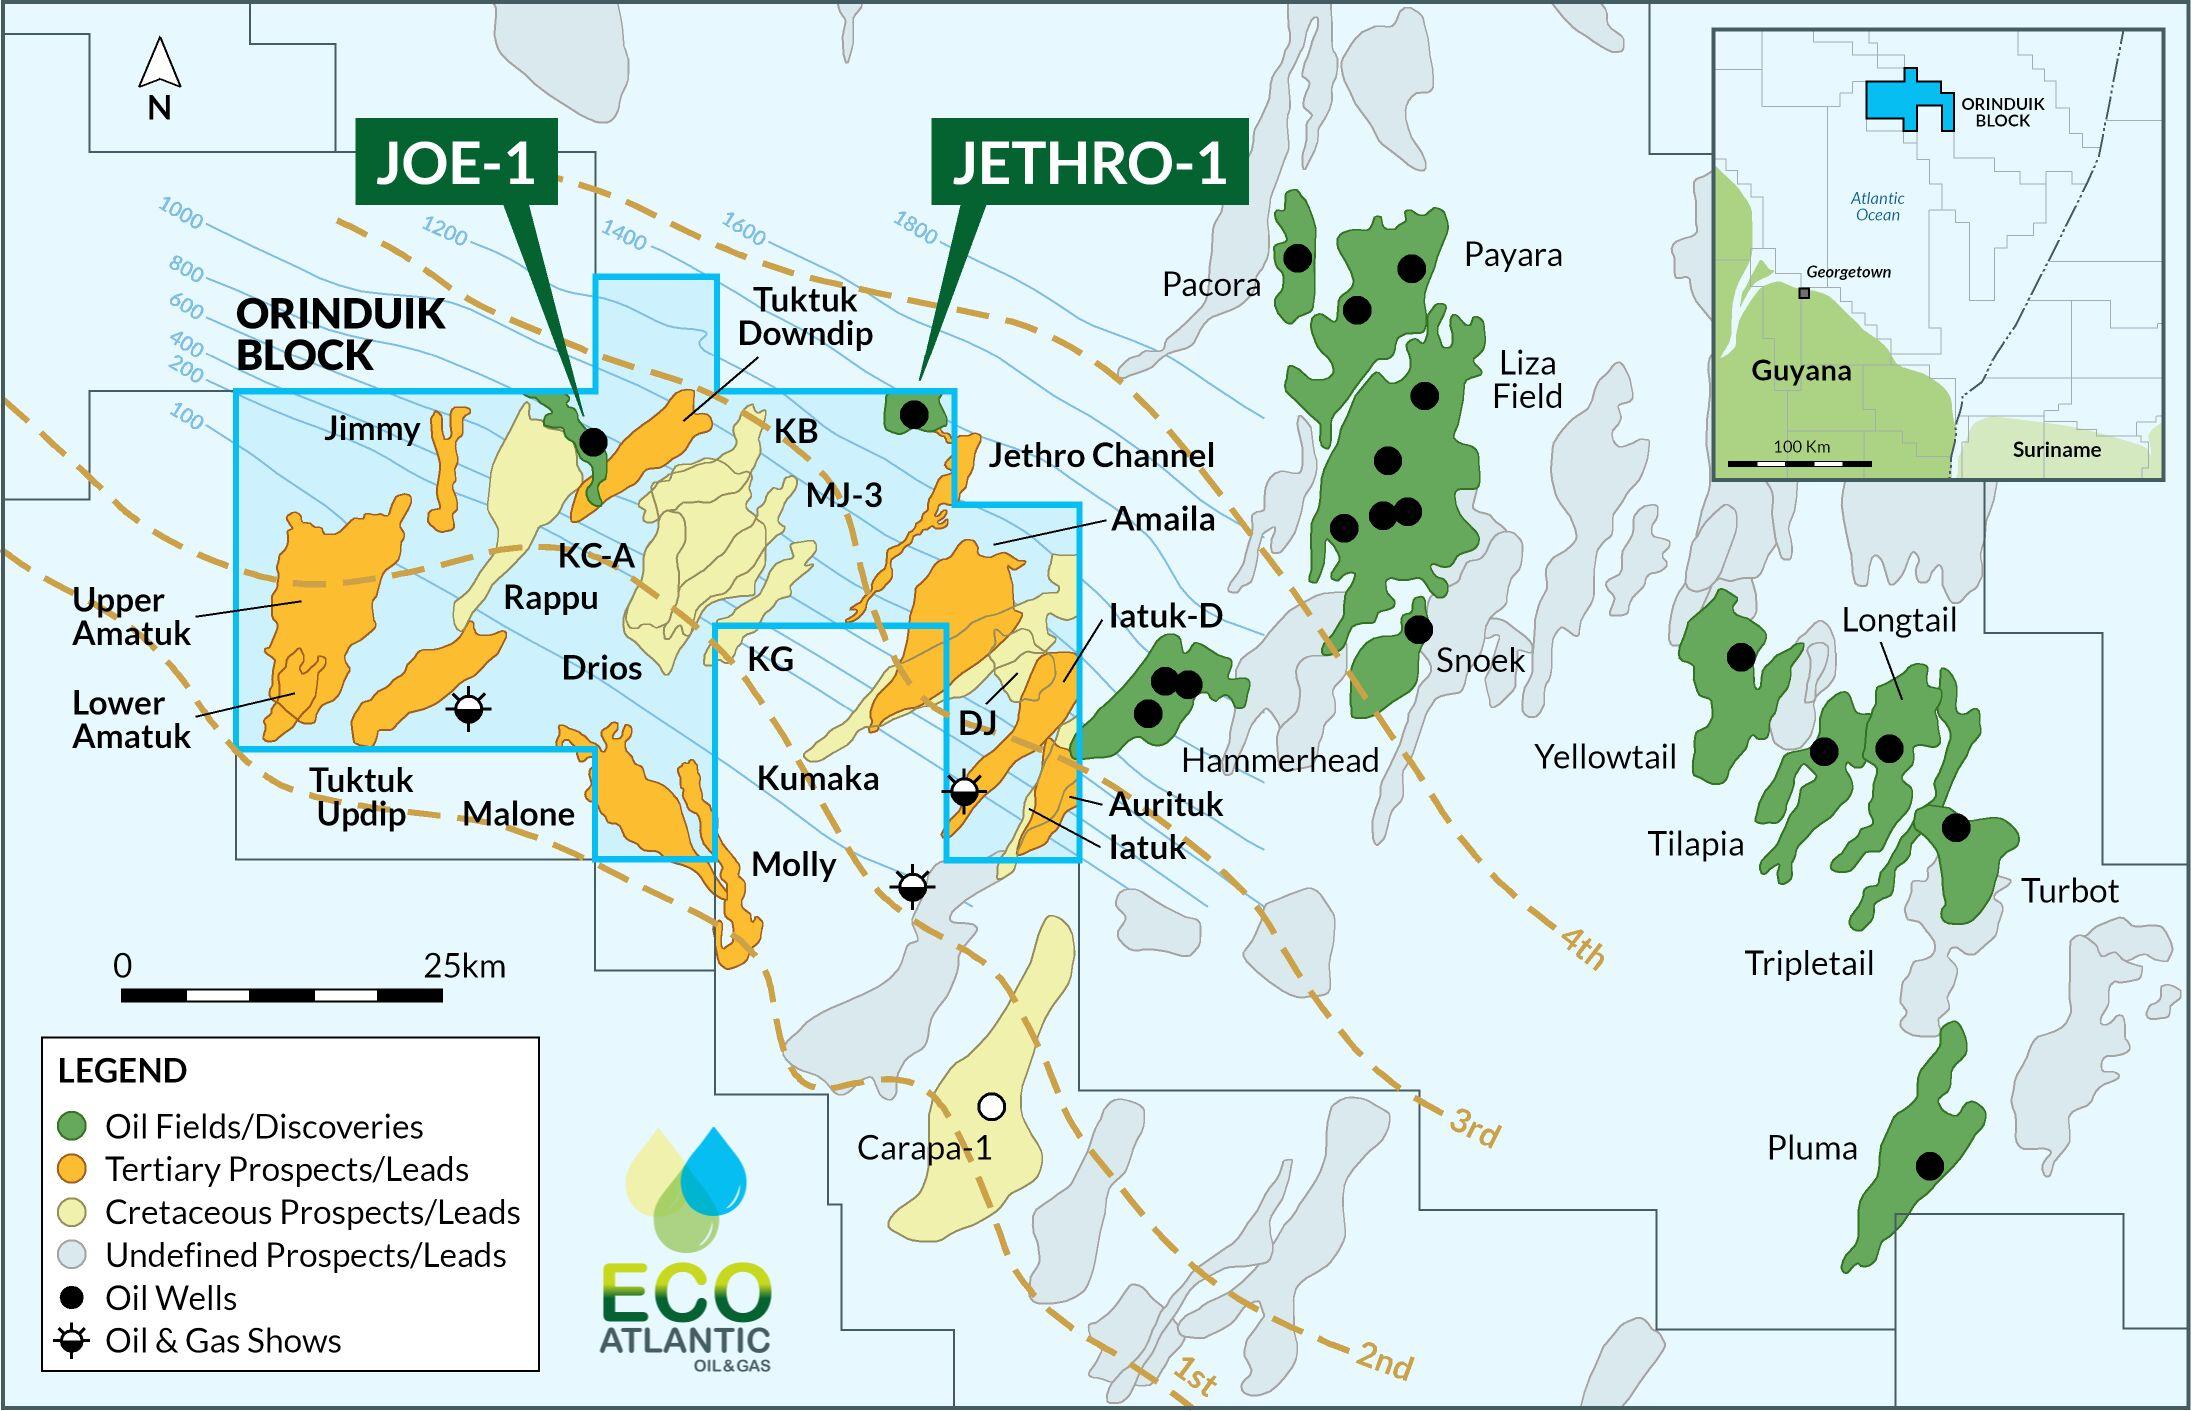 Eco Atlantic reveals major 2020 Orinduik drilling programme to follow up recent discoveries (ECO, TLW)